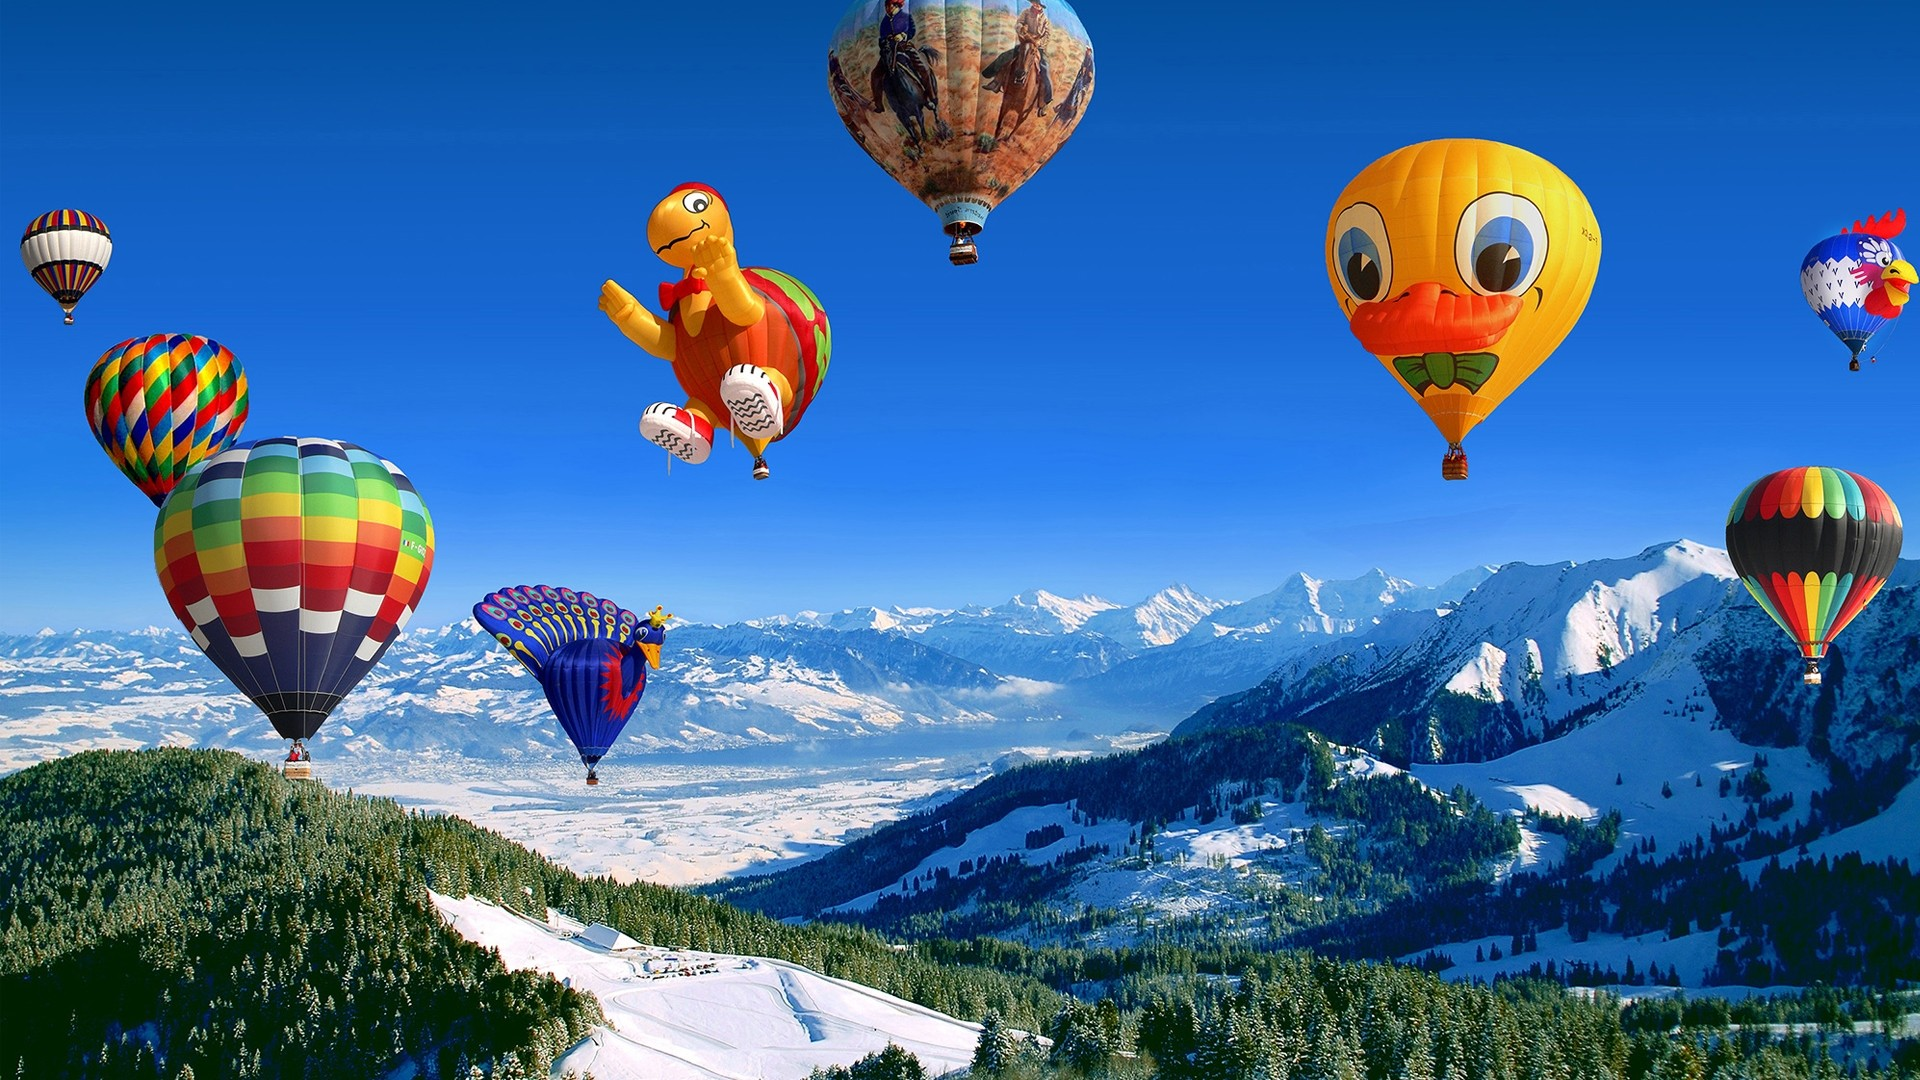 Balloon Wallpaper theme